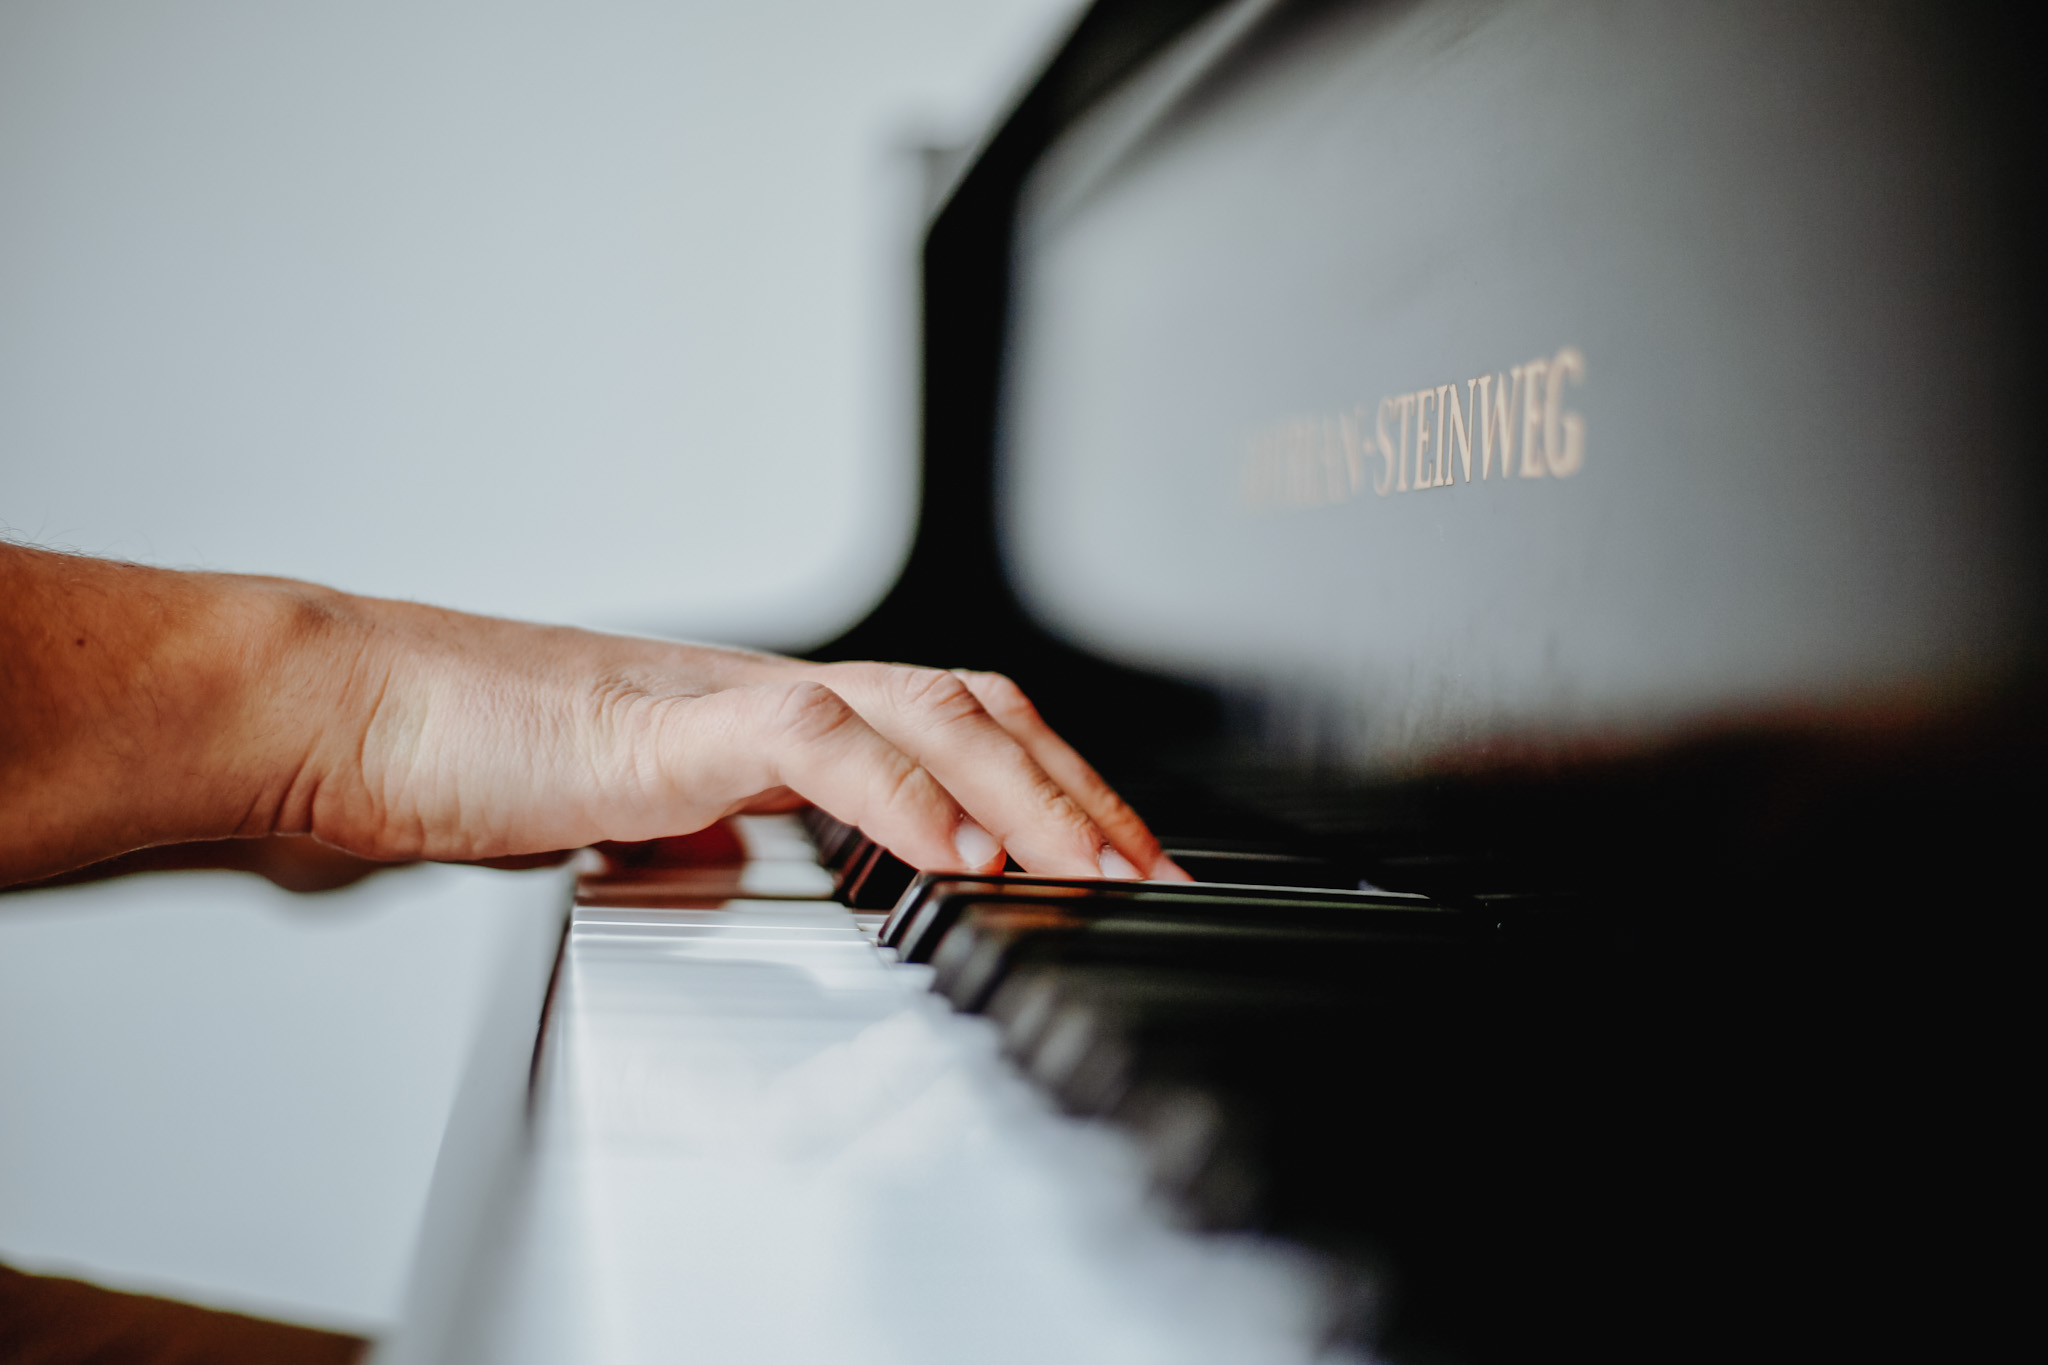 Hände am Klavier